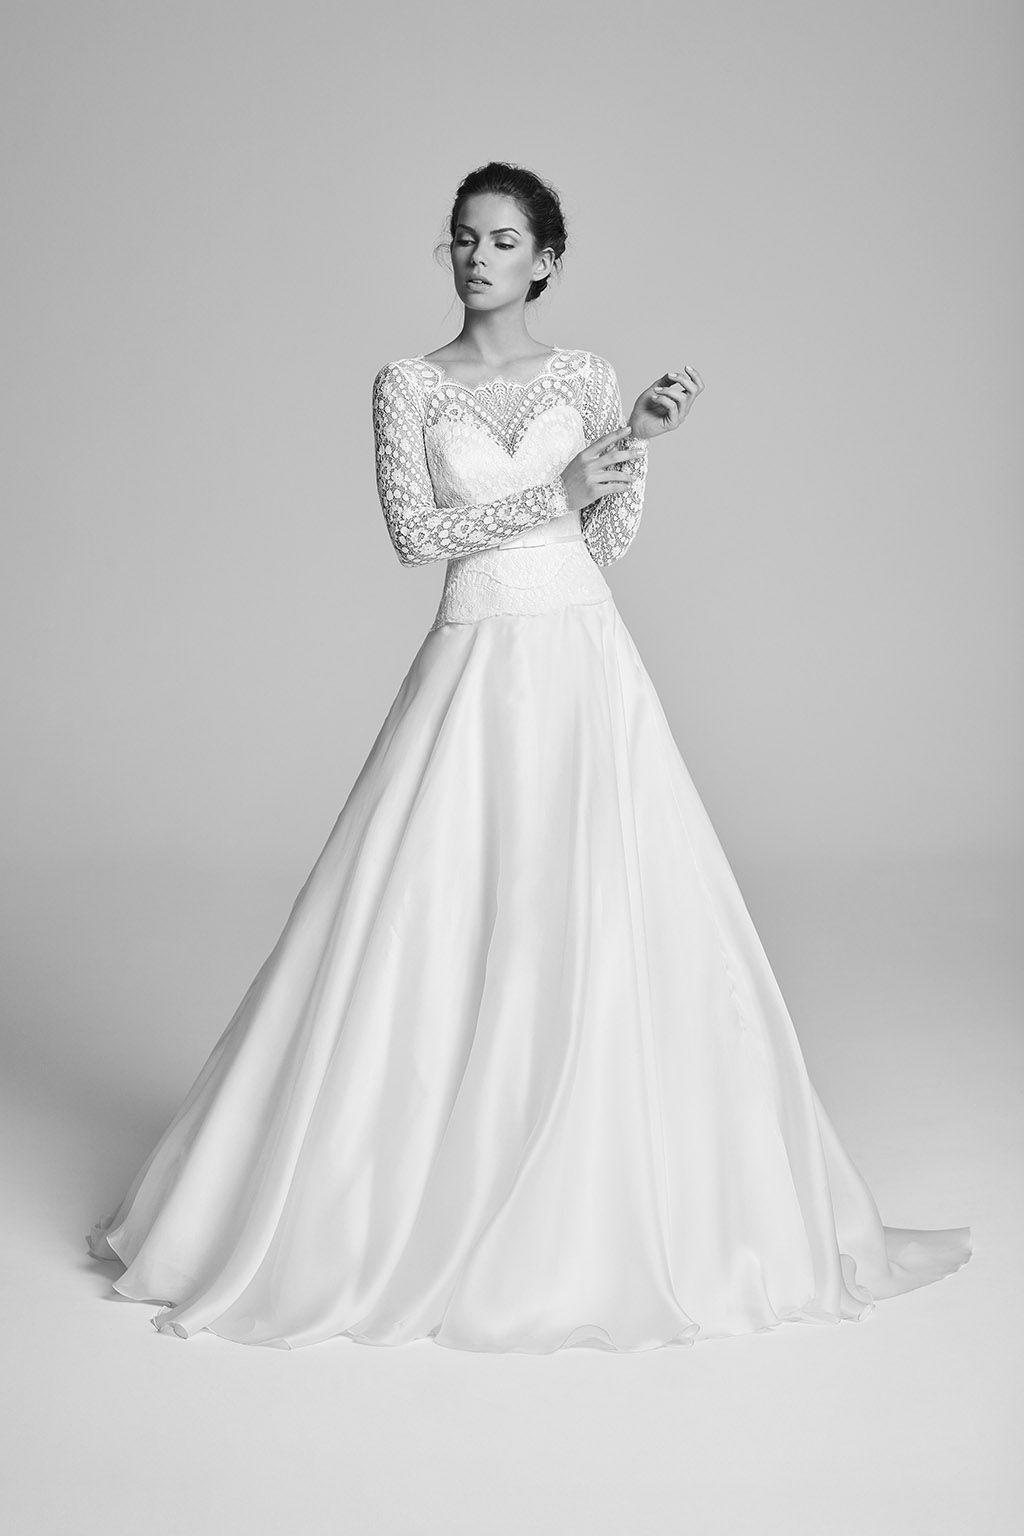 2018 bridesmaid dresses uk